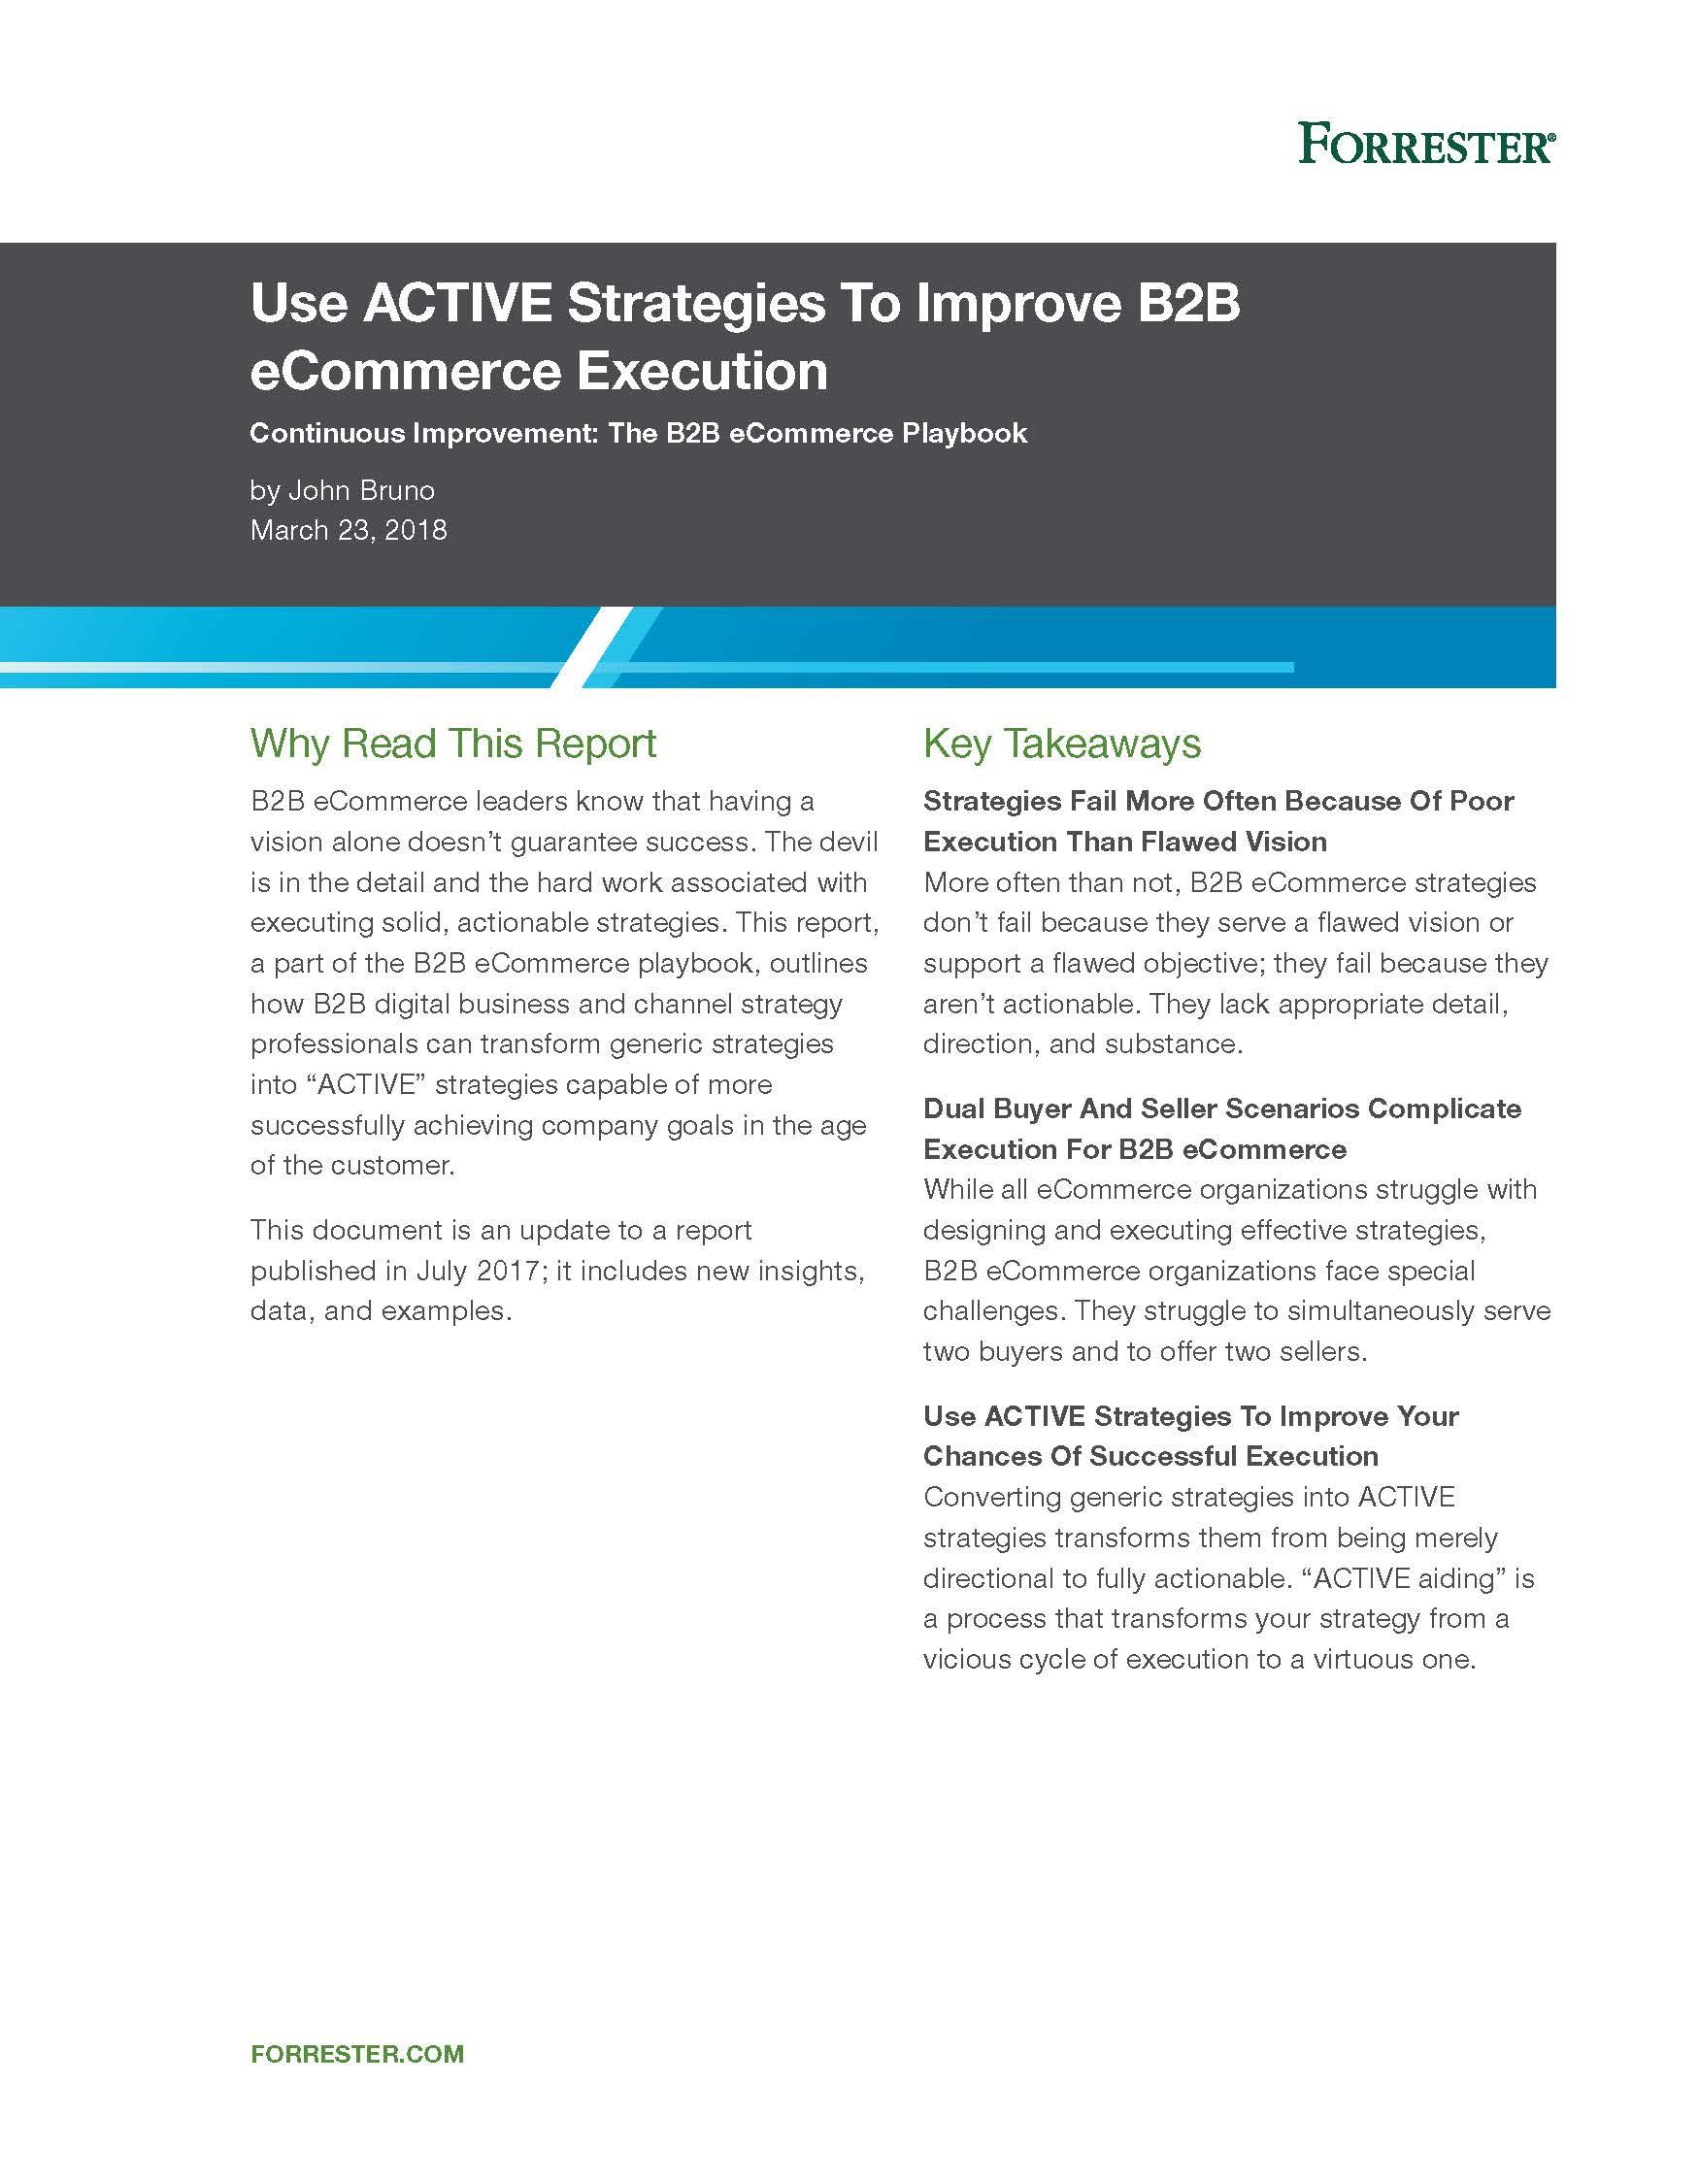 active-strategies-improve-b2b-ecommerce-execution